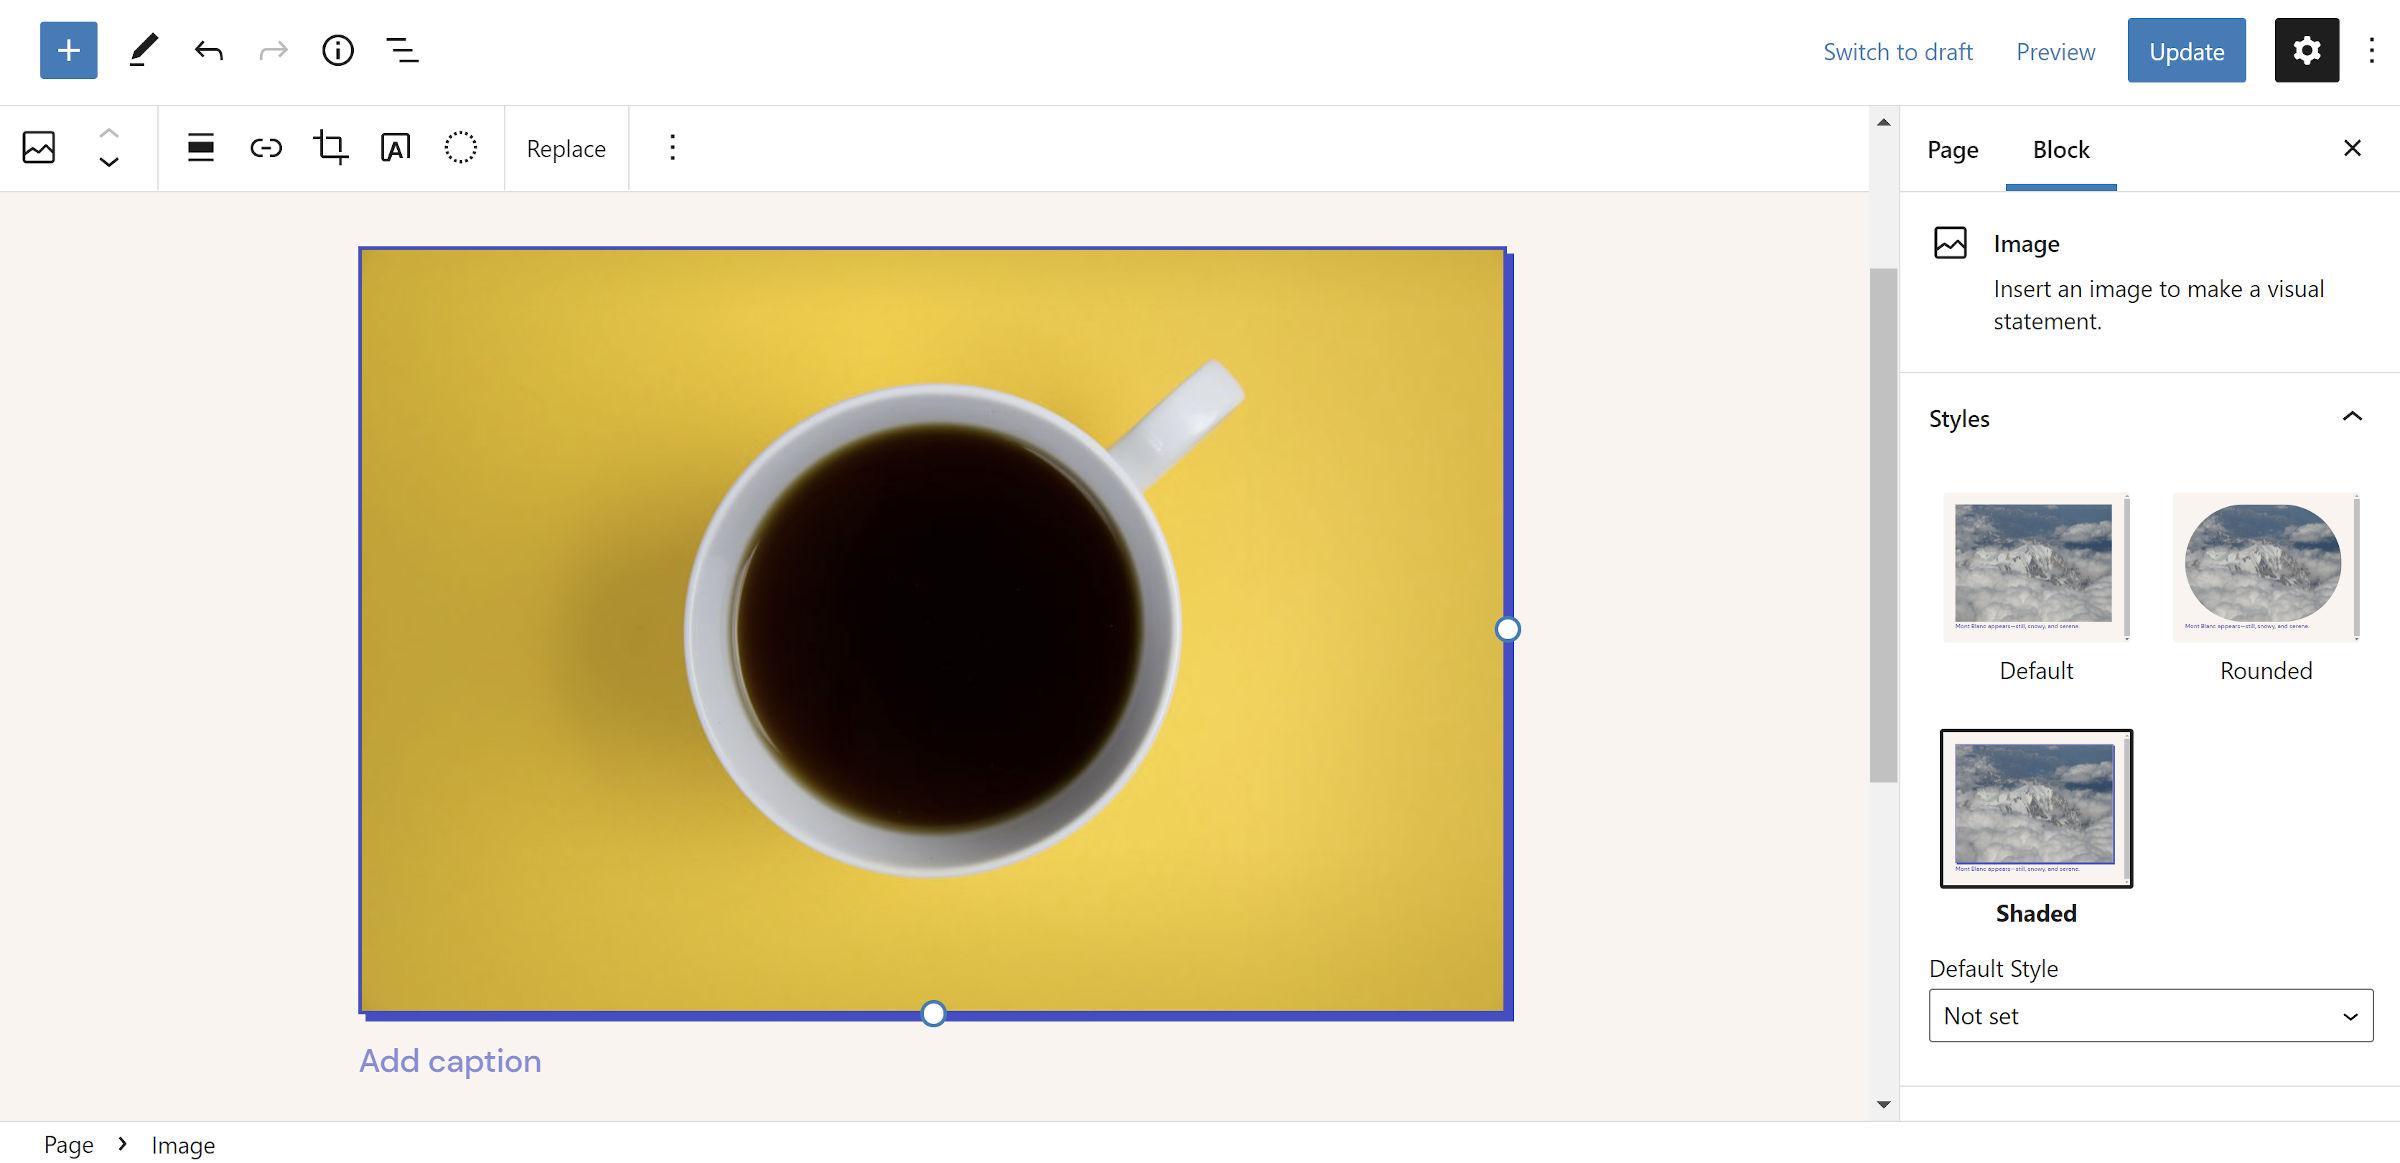 Blue drop-shadow on an image of a coffee in a mug in the WordPress editor.